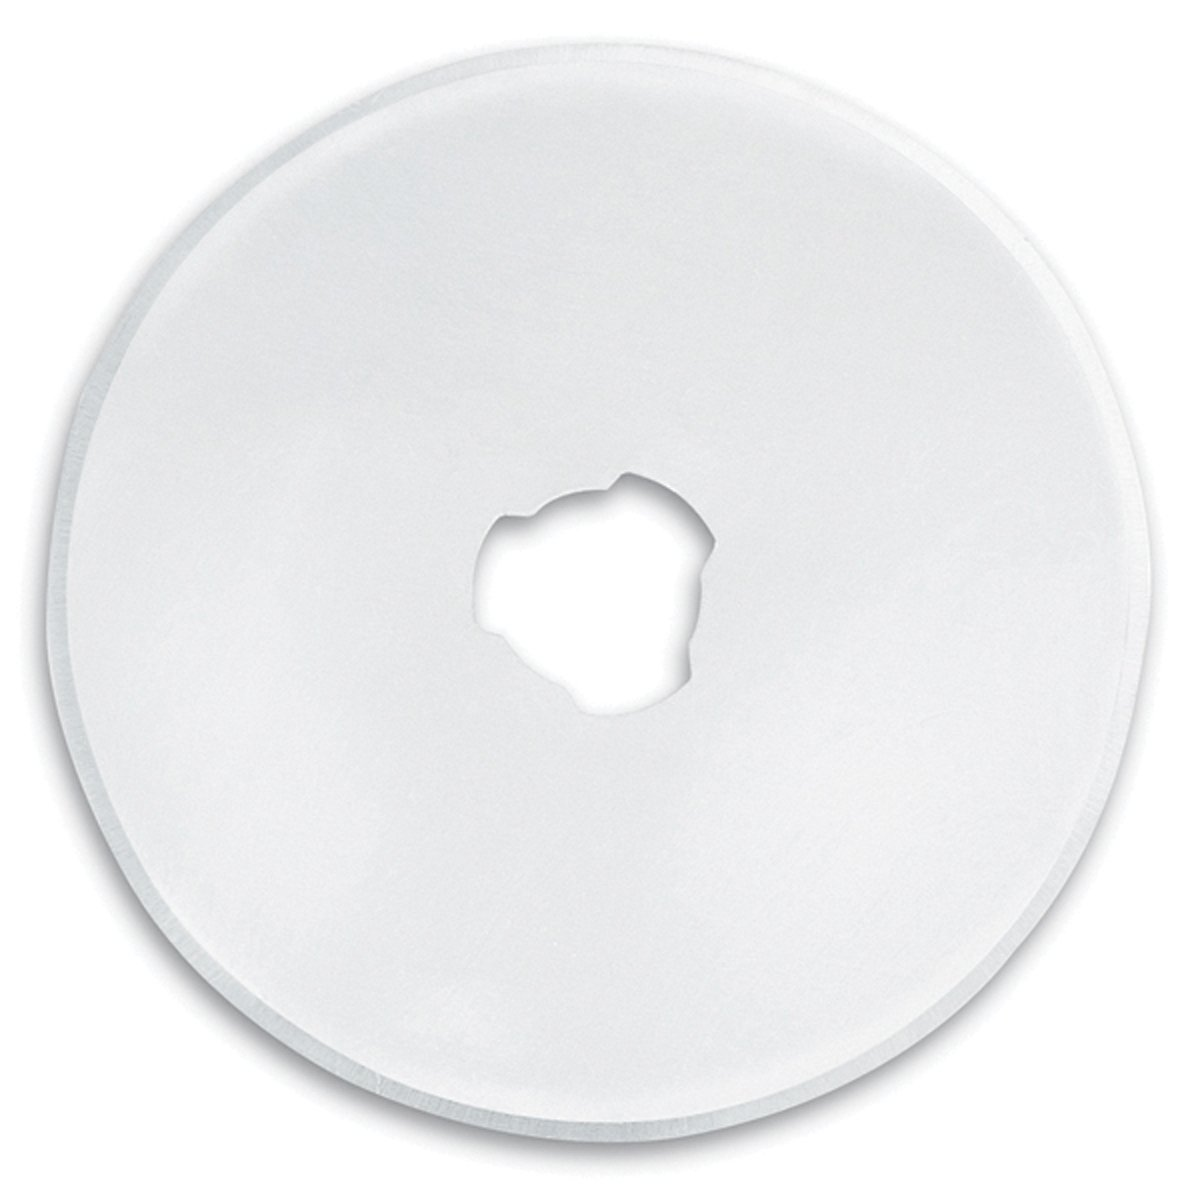 Hoja de marcado giratoria Fiskars, estilo B, 45 mm, acero in